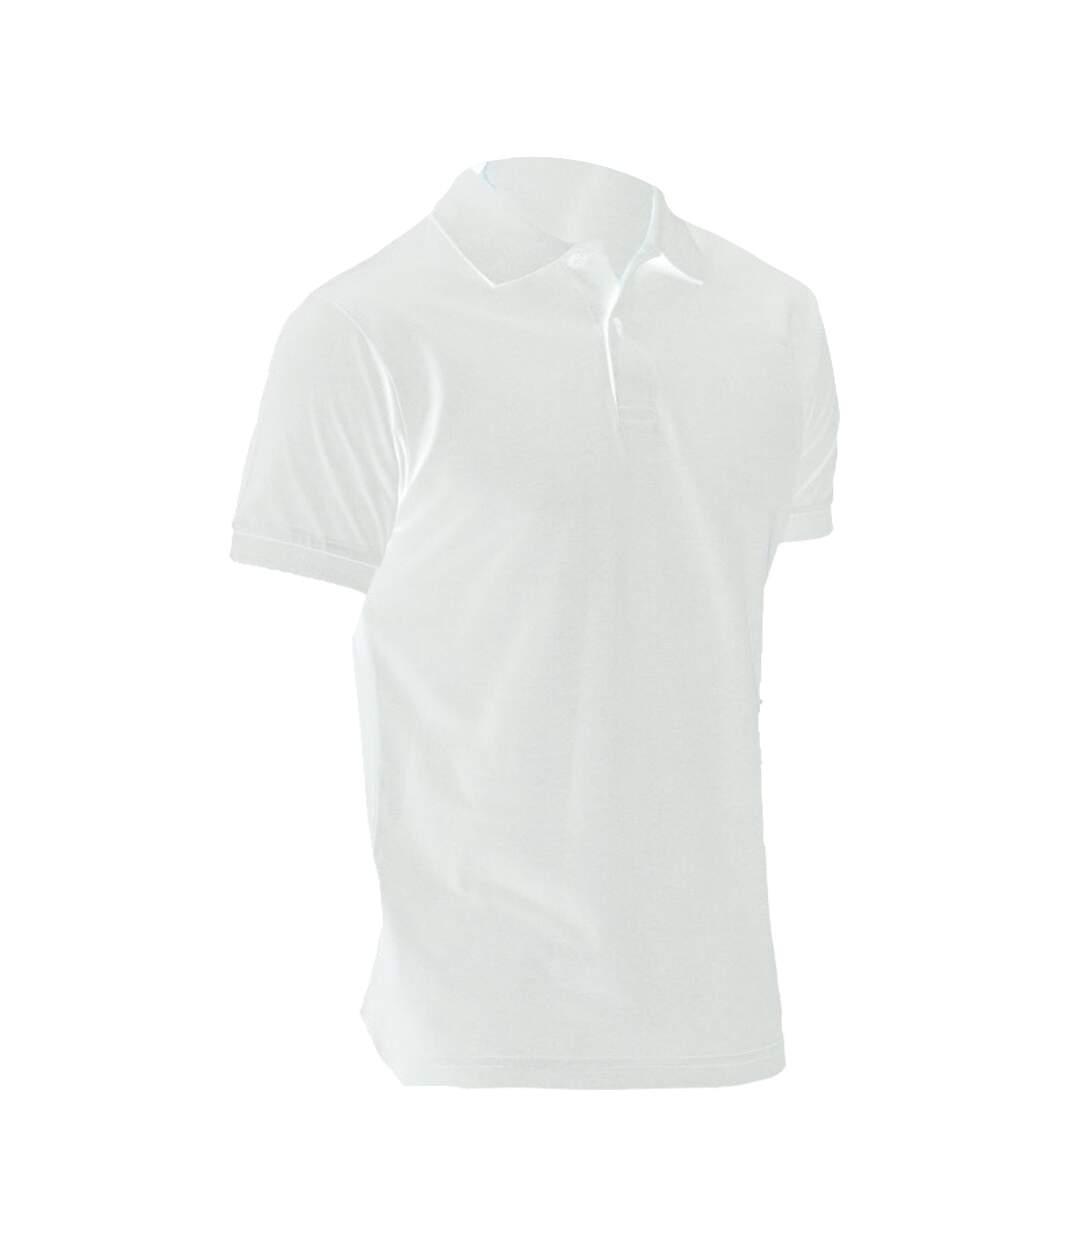 SOLS Mens Perfect Pique Short Sleeve Polo Shirt (Royal Blue) - UTPC283